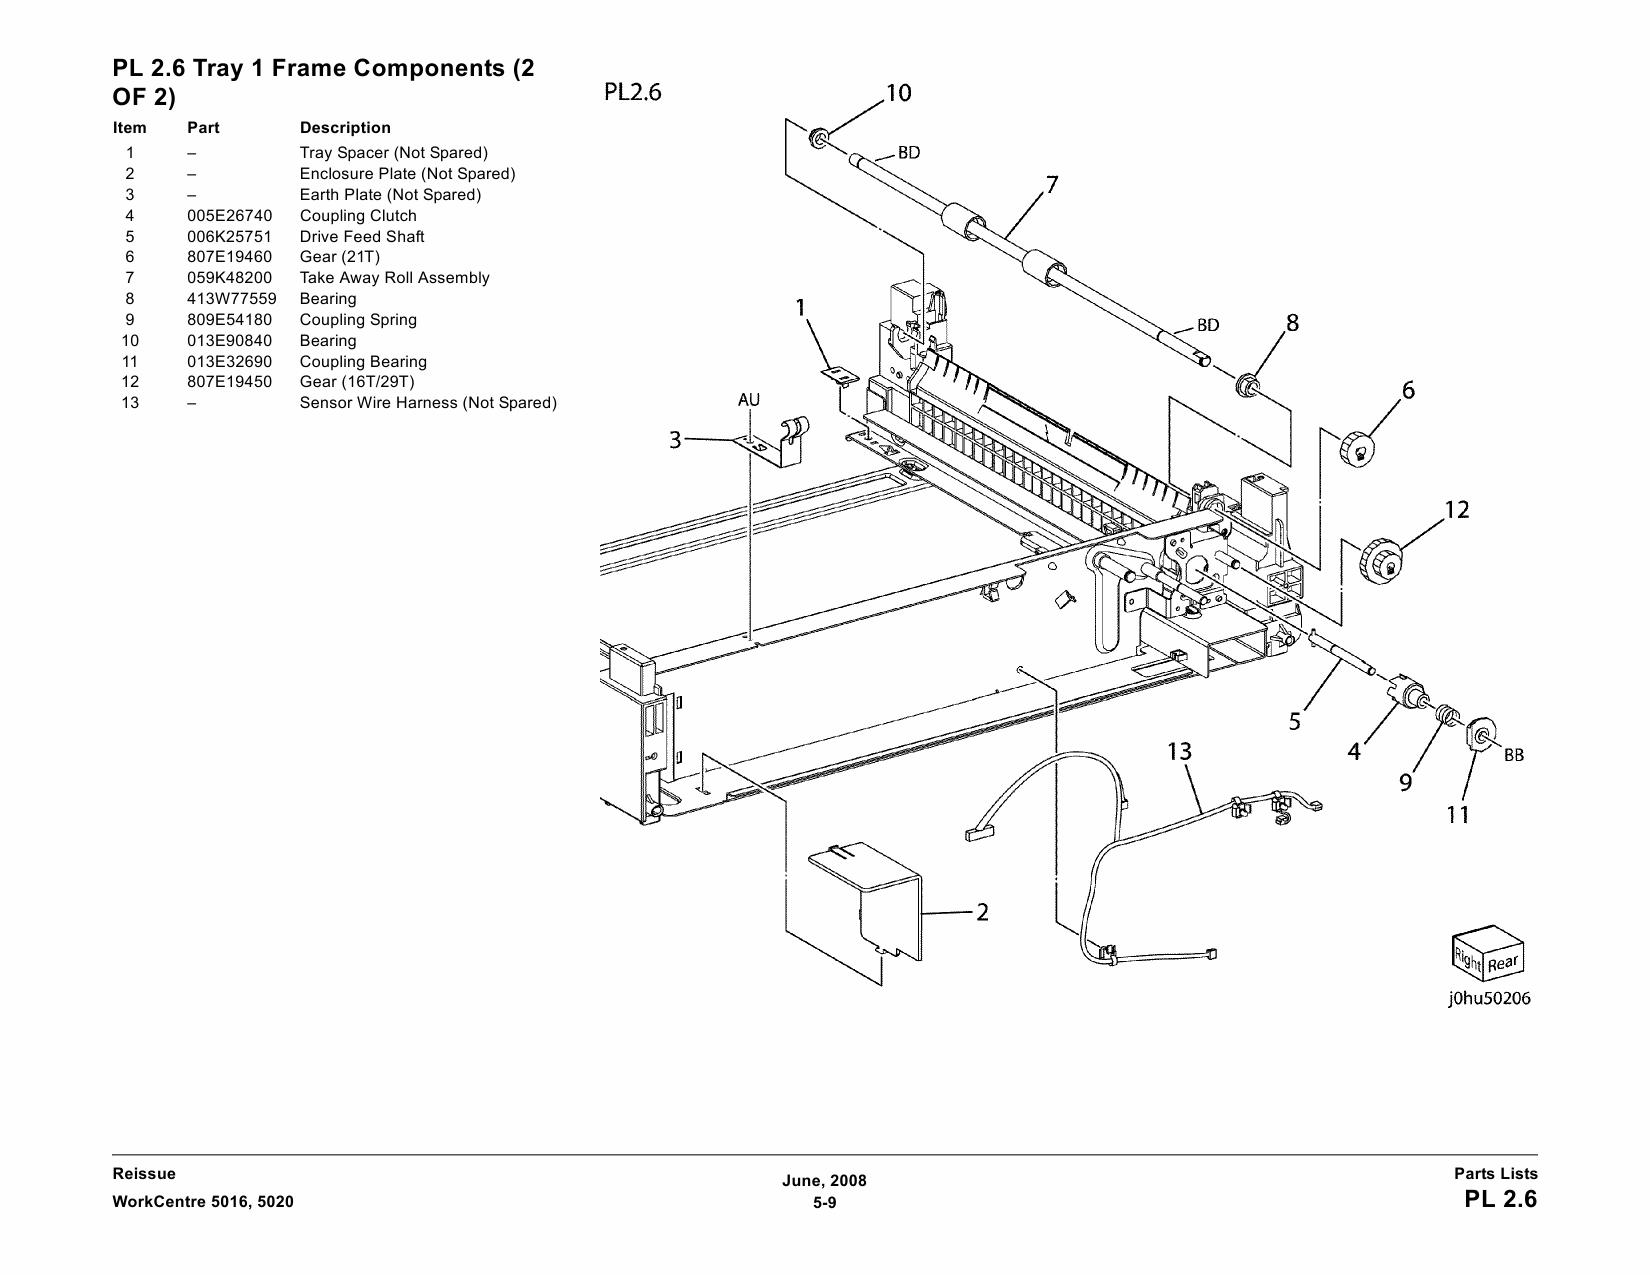 Xerox workcentre 5020 service manual soup. Ioasset-1. Soup. Io.